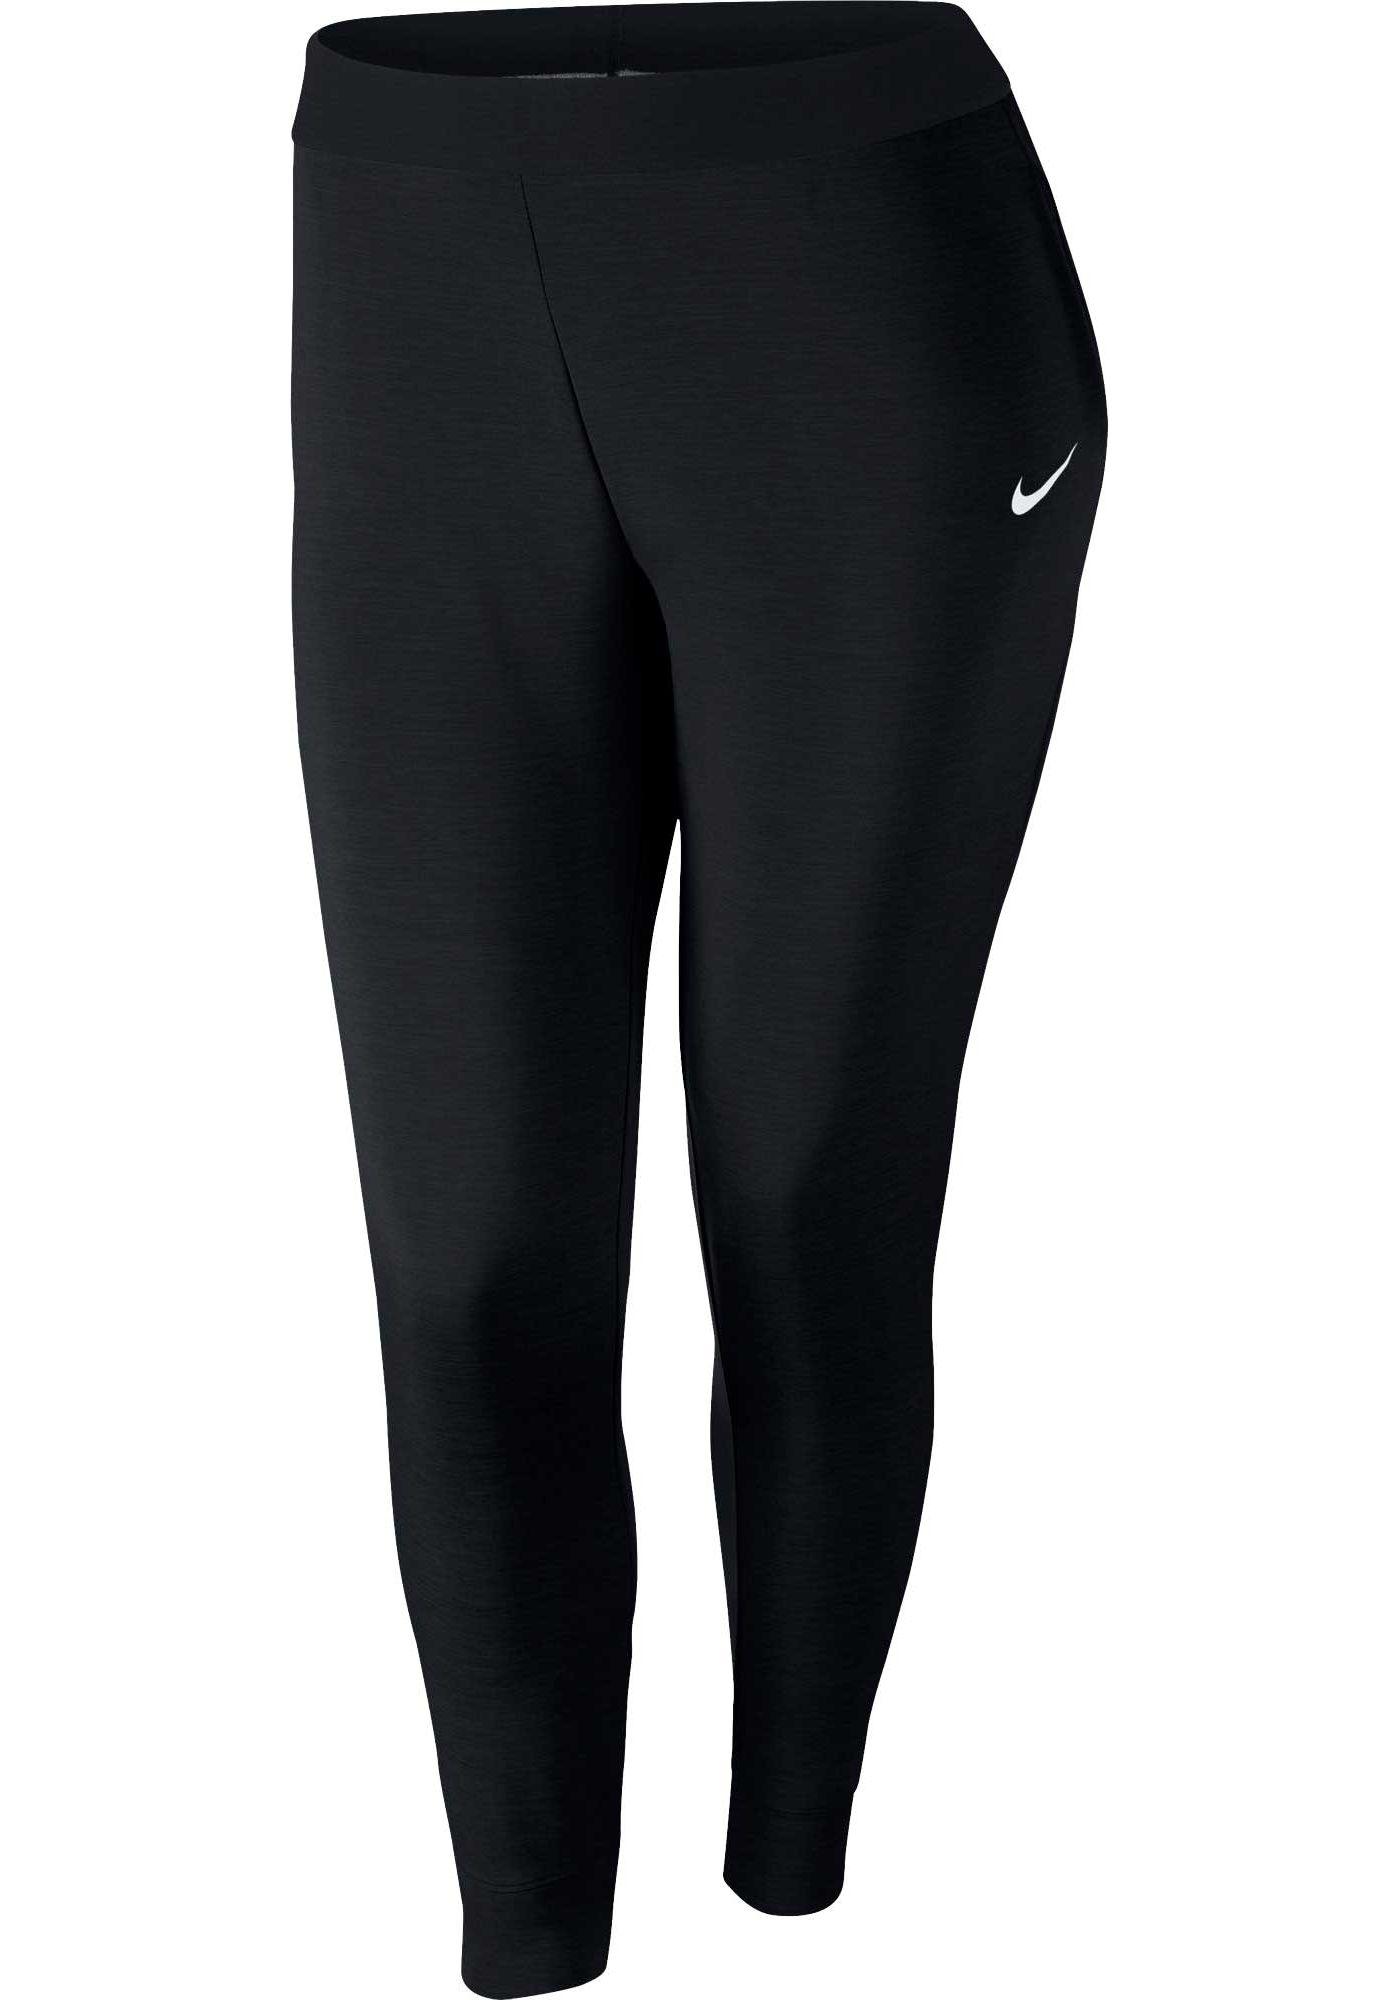 Nike Women's Plus Size Flex Bliss Training Pants